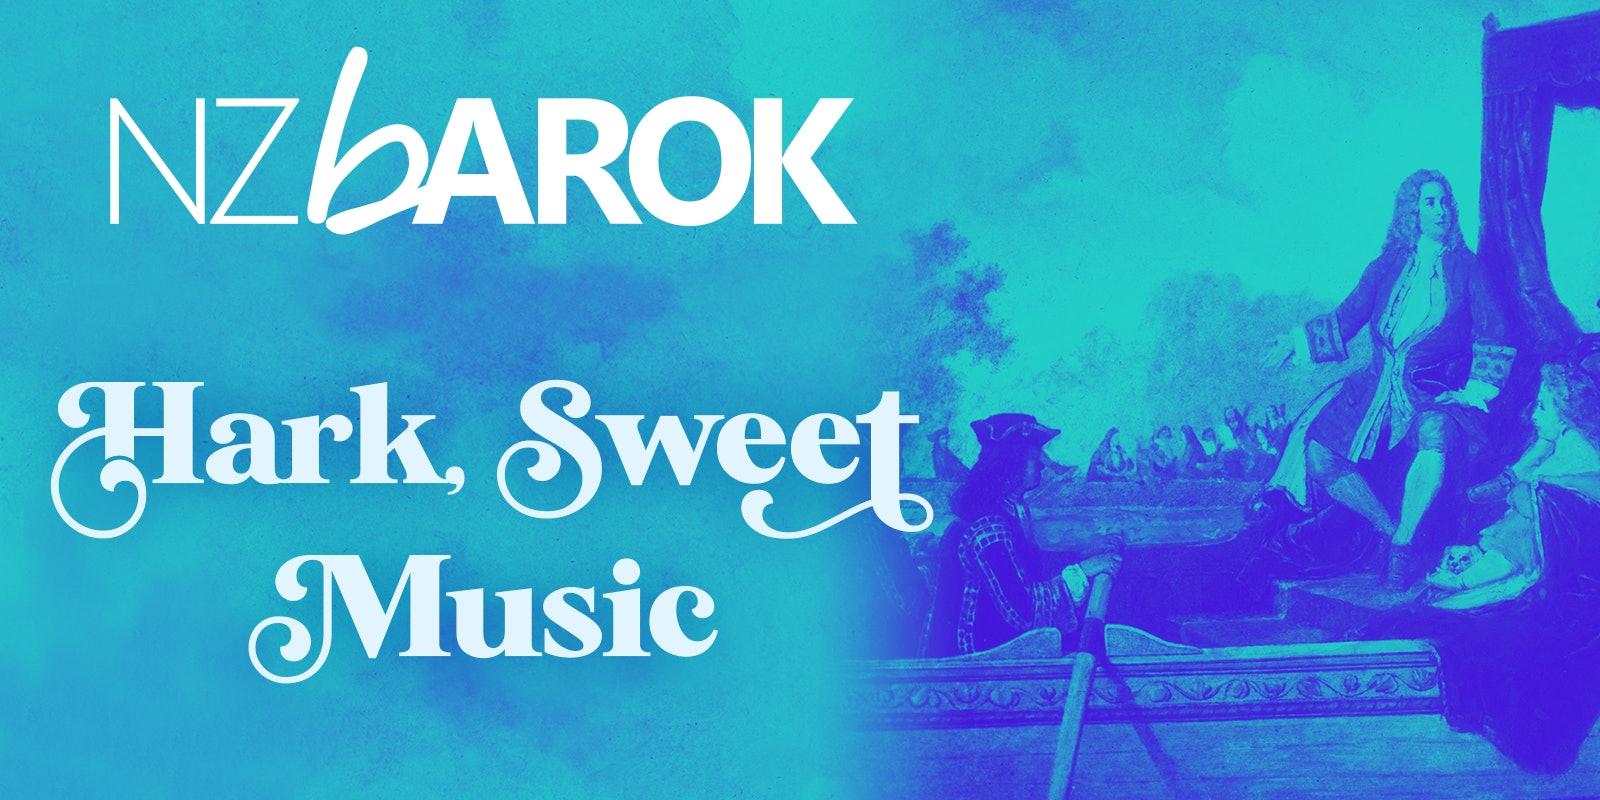 Hark, Sweet Music